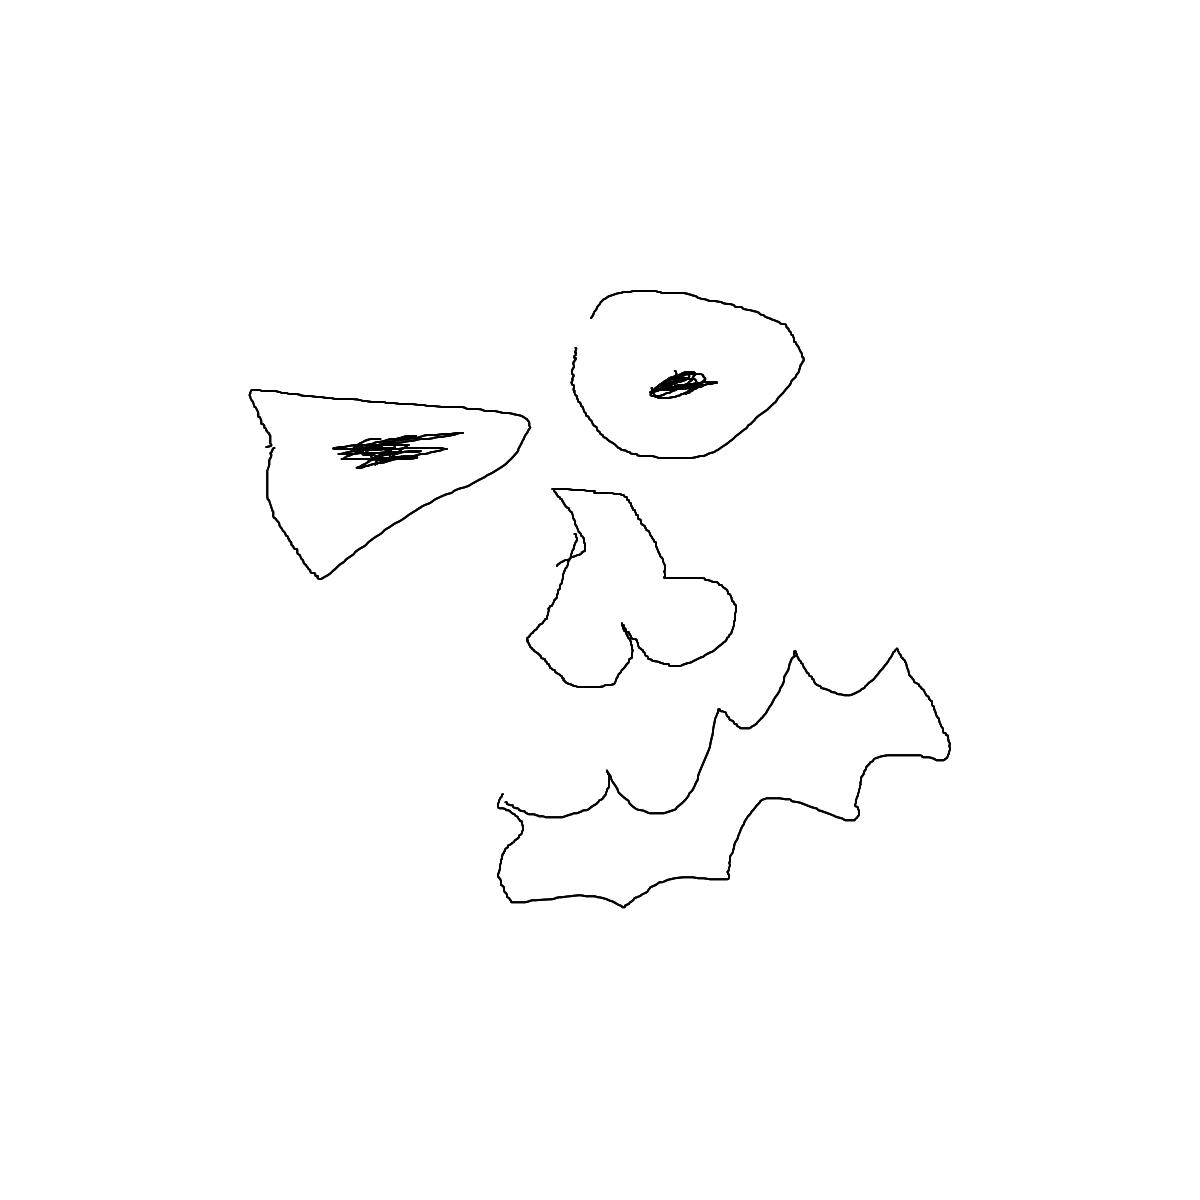 BAAAM drawing#7816 lat:41.0770797729492200lng: -73.4699478149414000